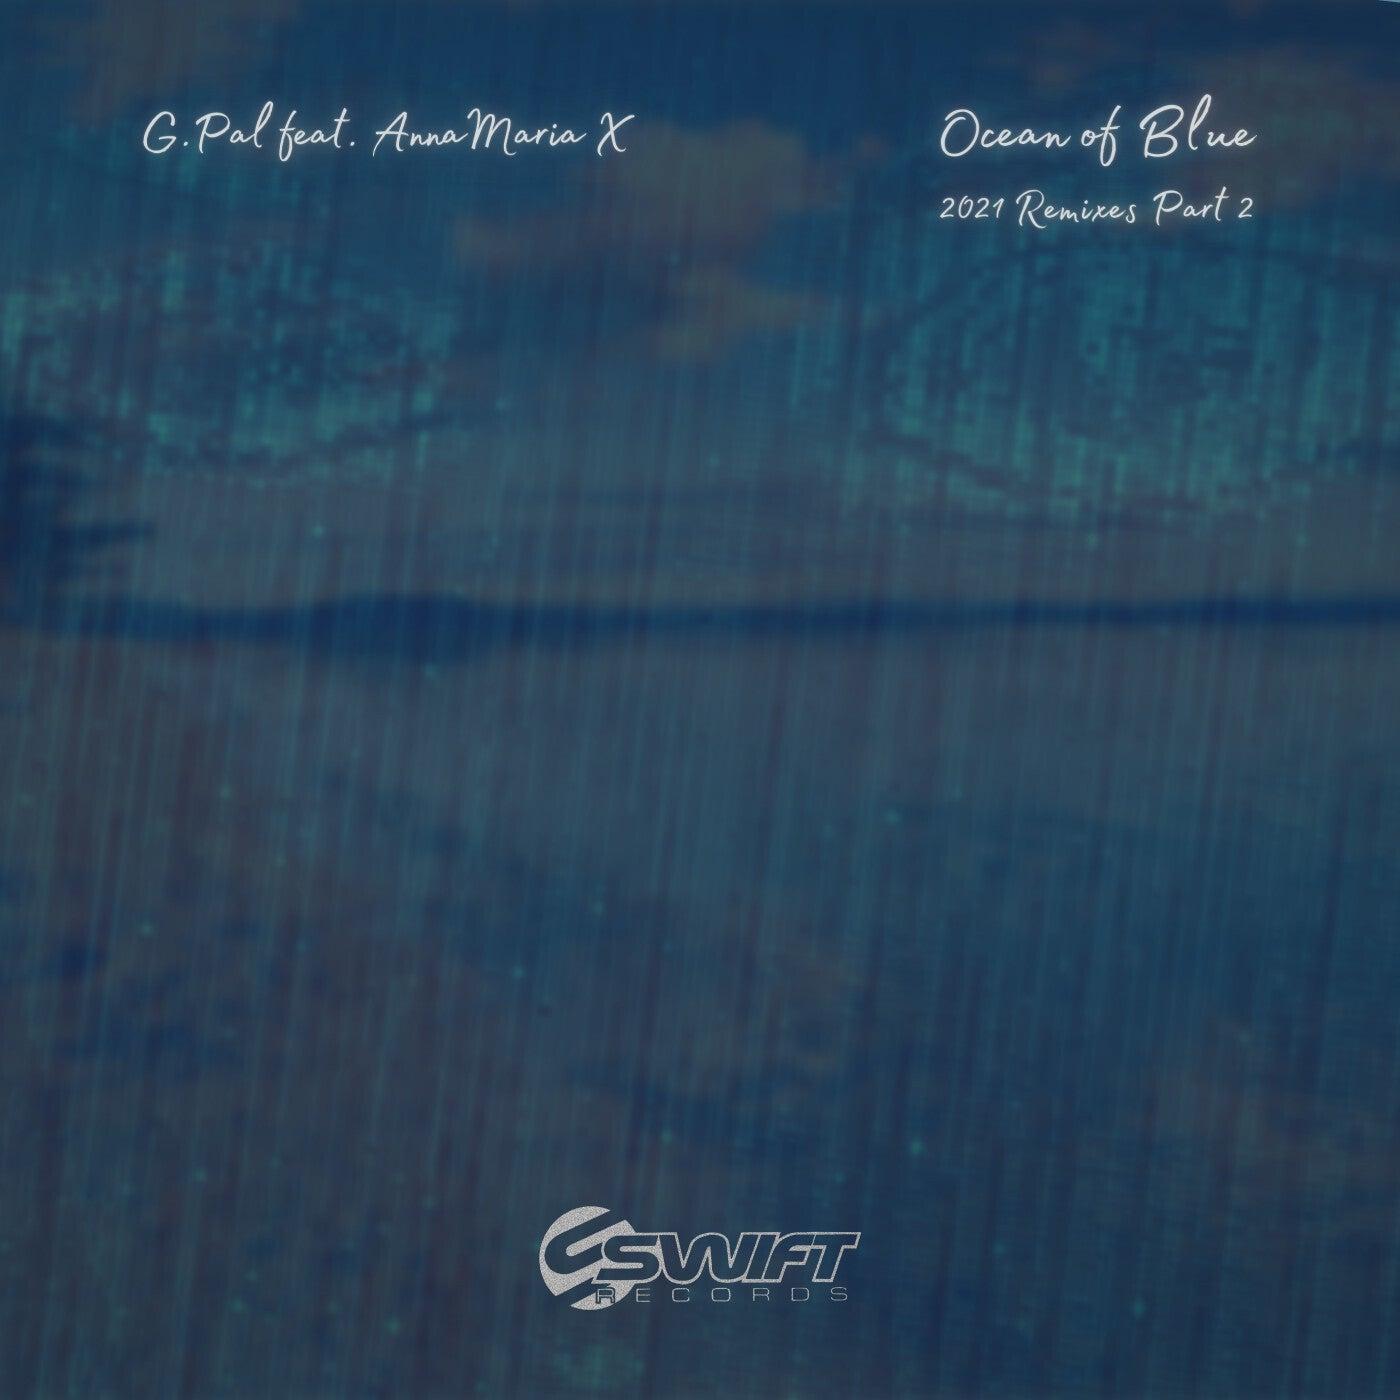 Ocean Of Blue (Alexandros Djkevingr & Greg Ignatovich Remix)